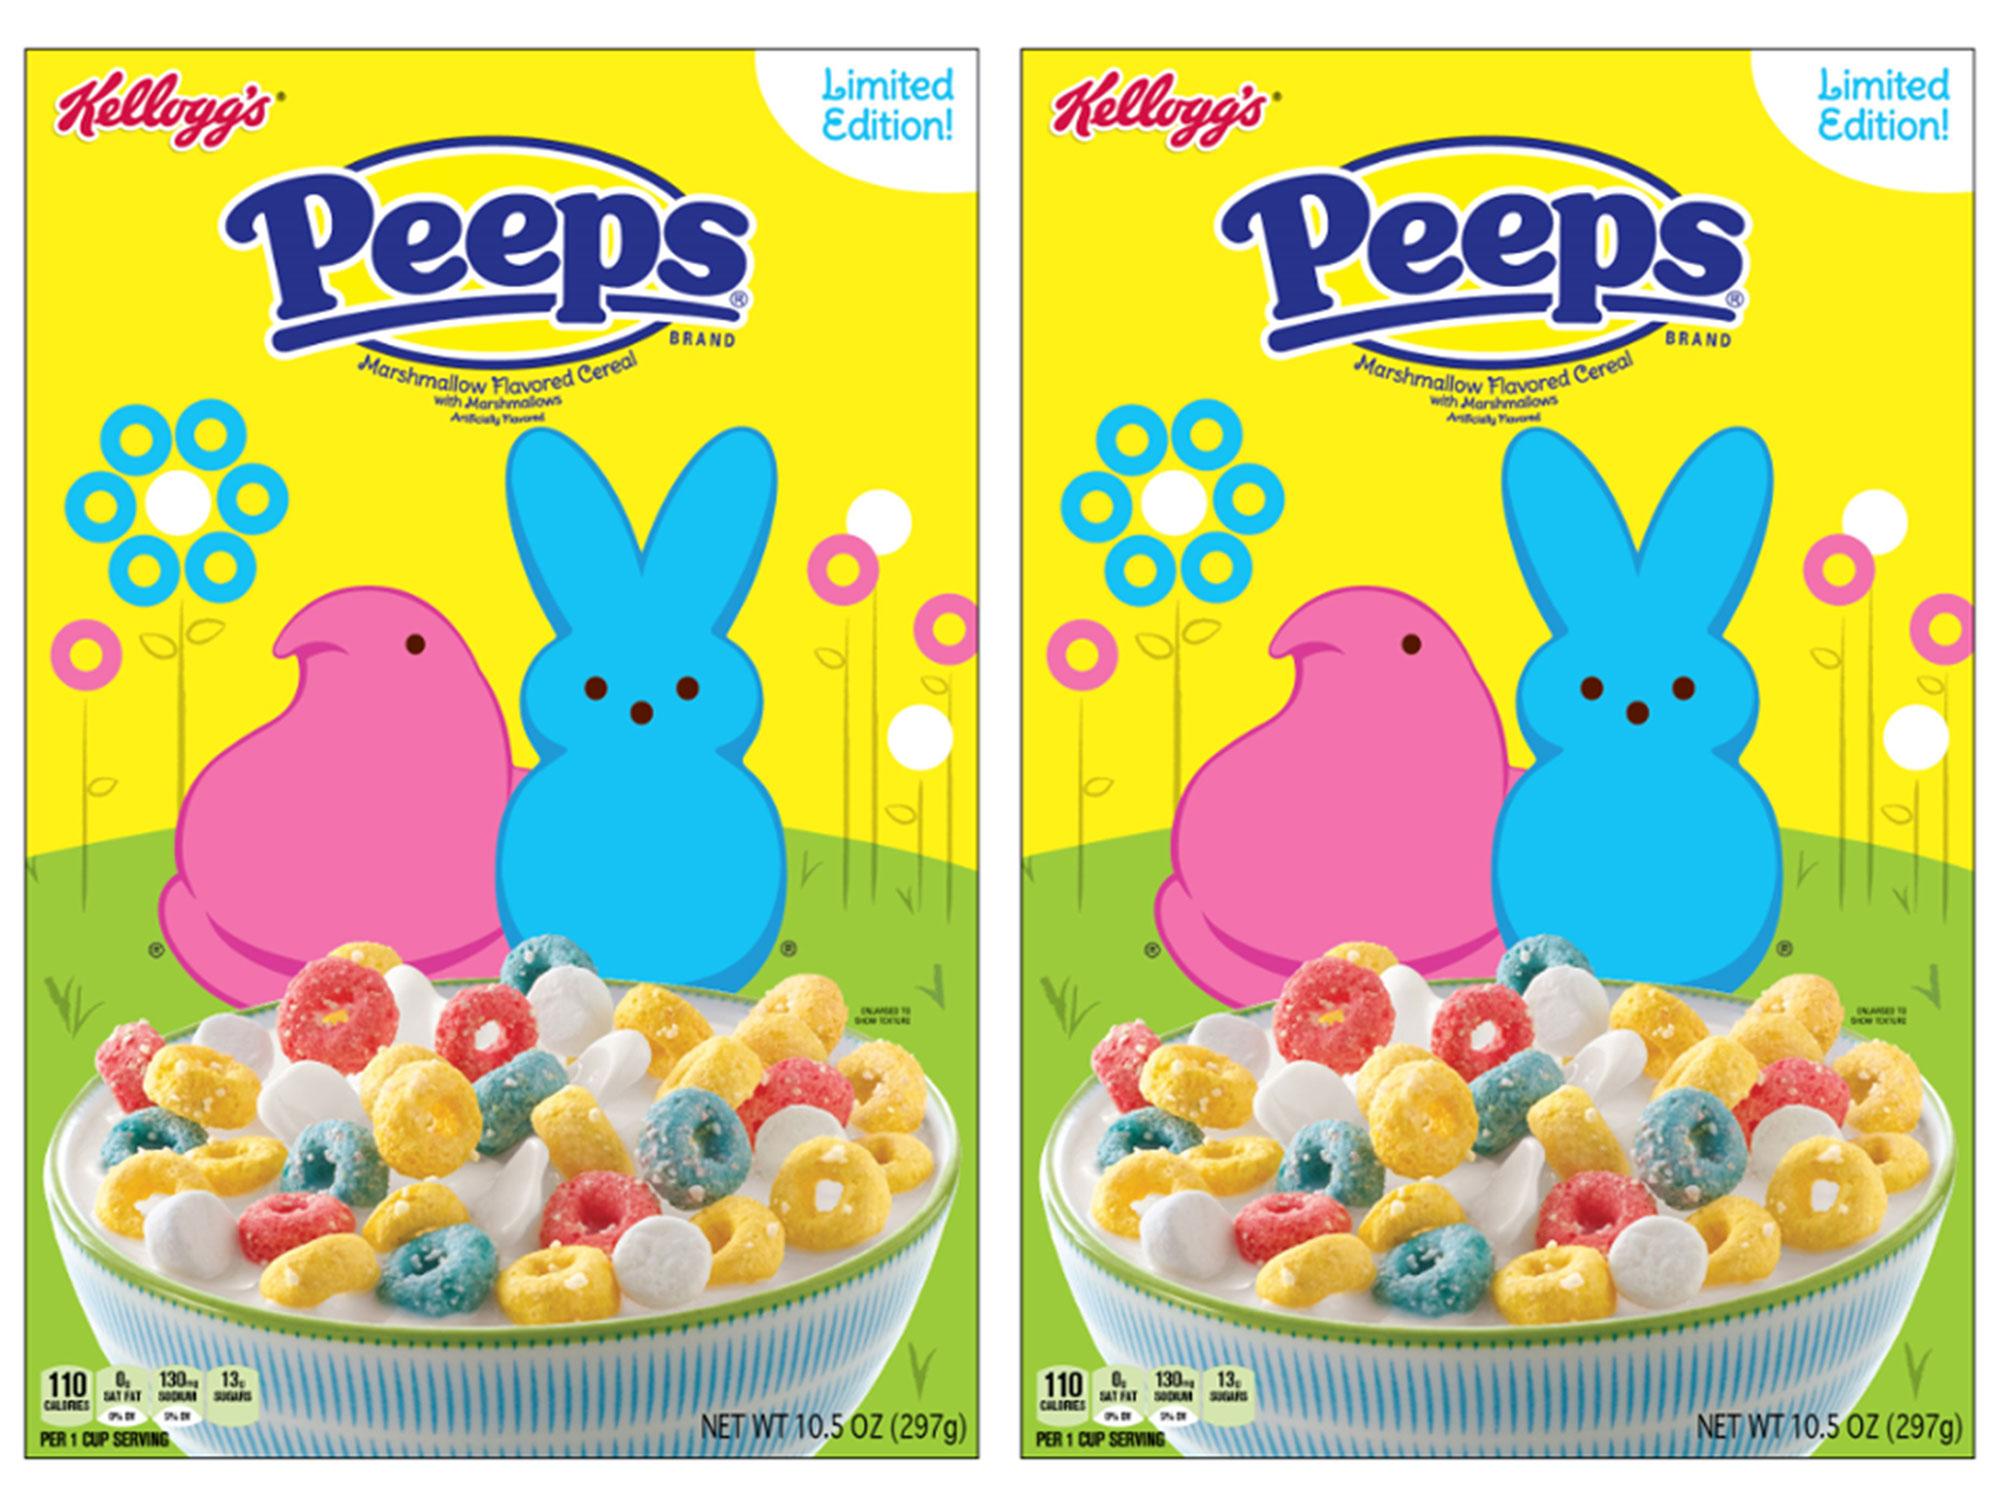 Peeps Cereal Is the Ultimate Love-It-Or-Hate-It Breakfast